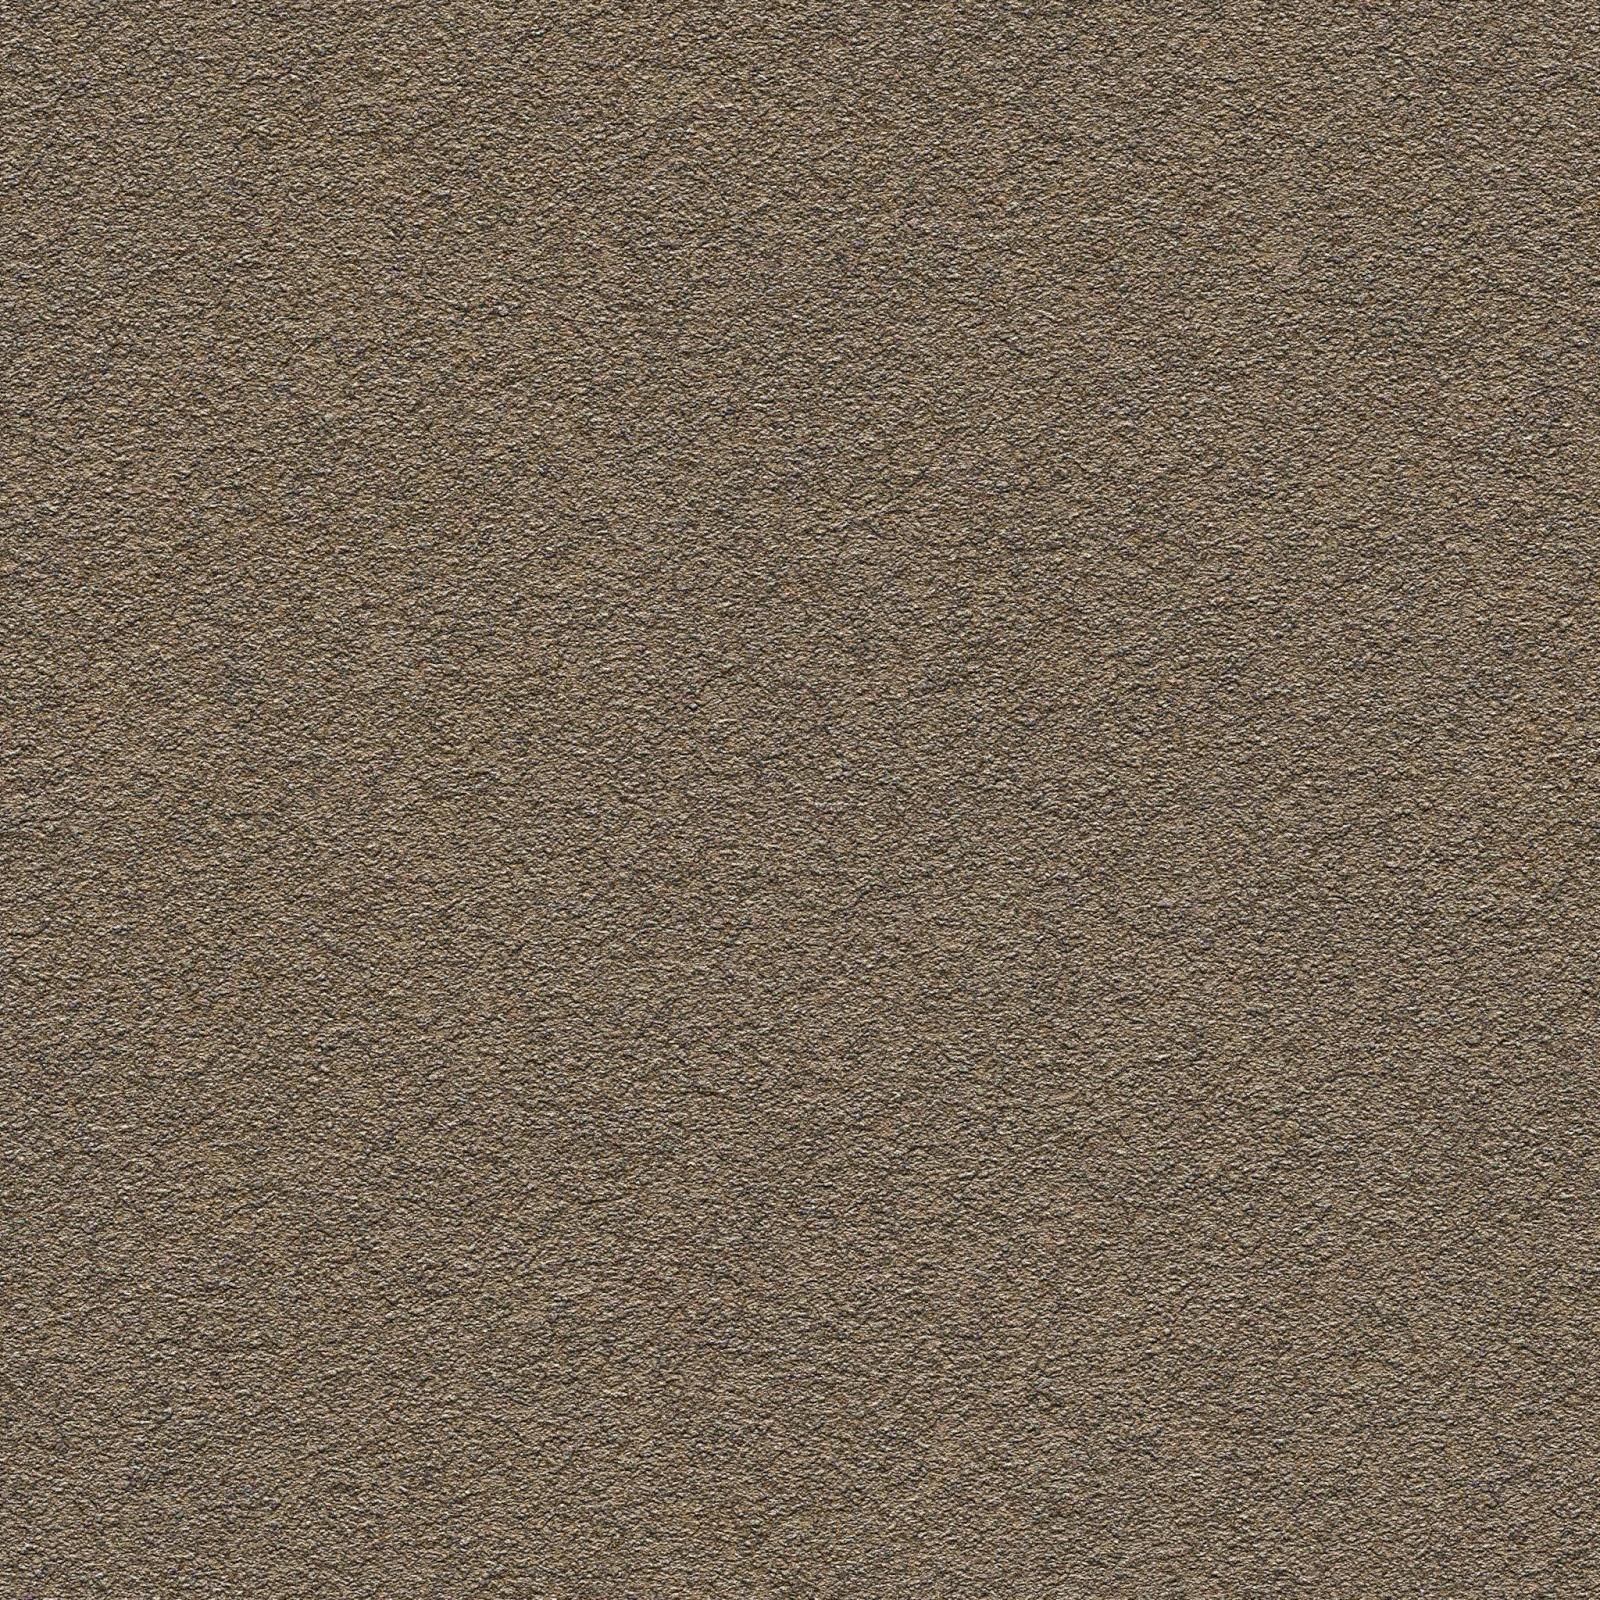 Tarmac_road_surface_asphalt_ground_texture_seamless_tileable